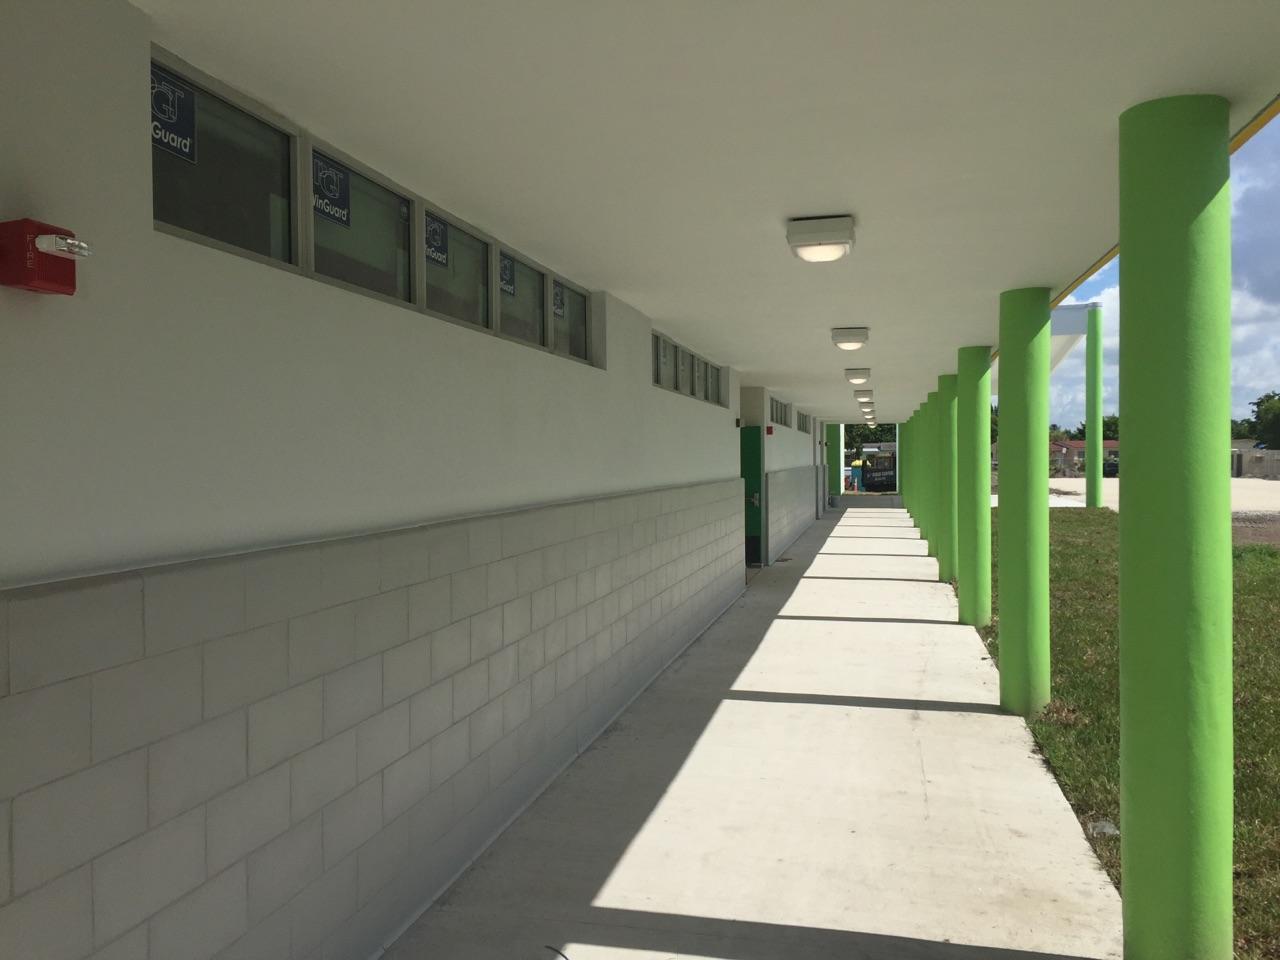 Norland Elementary School